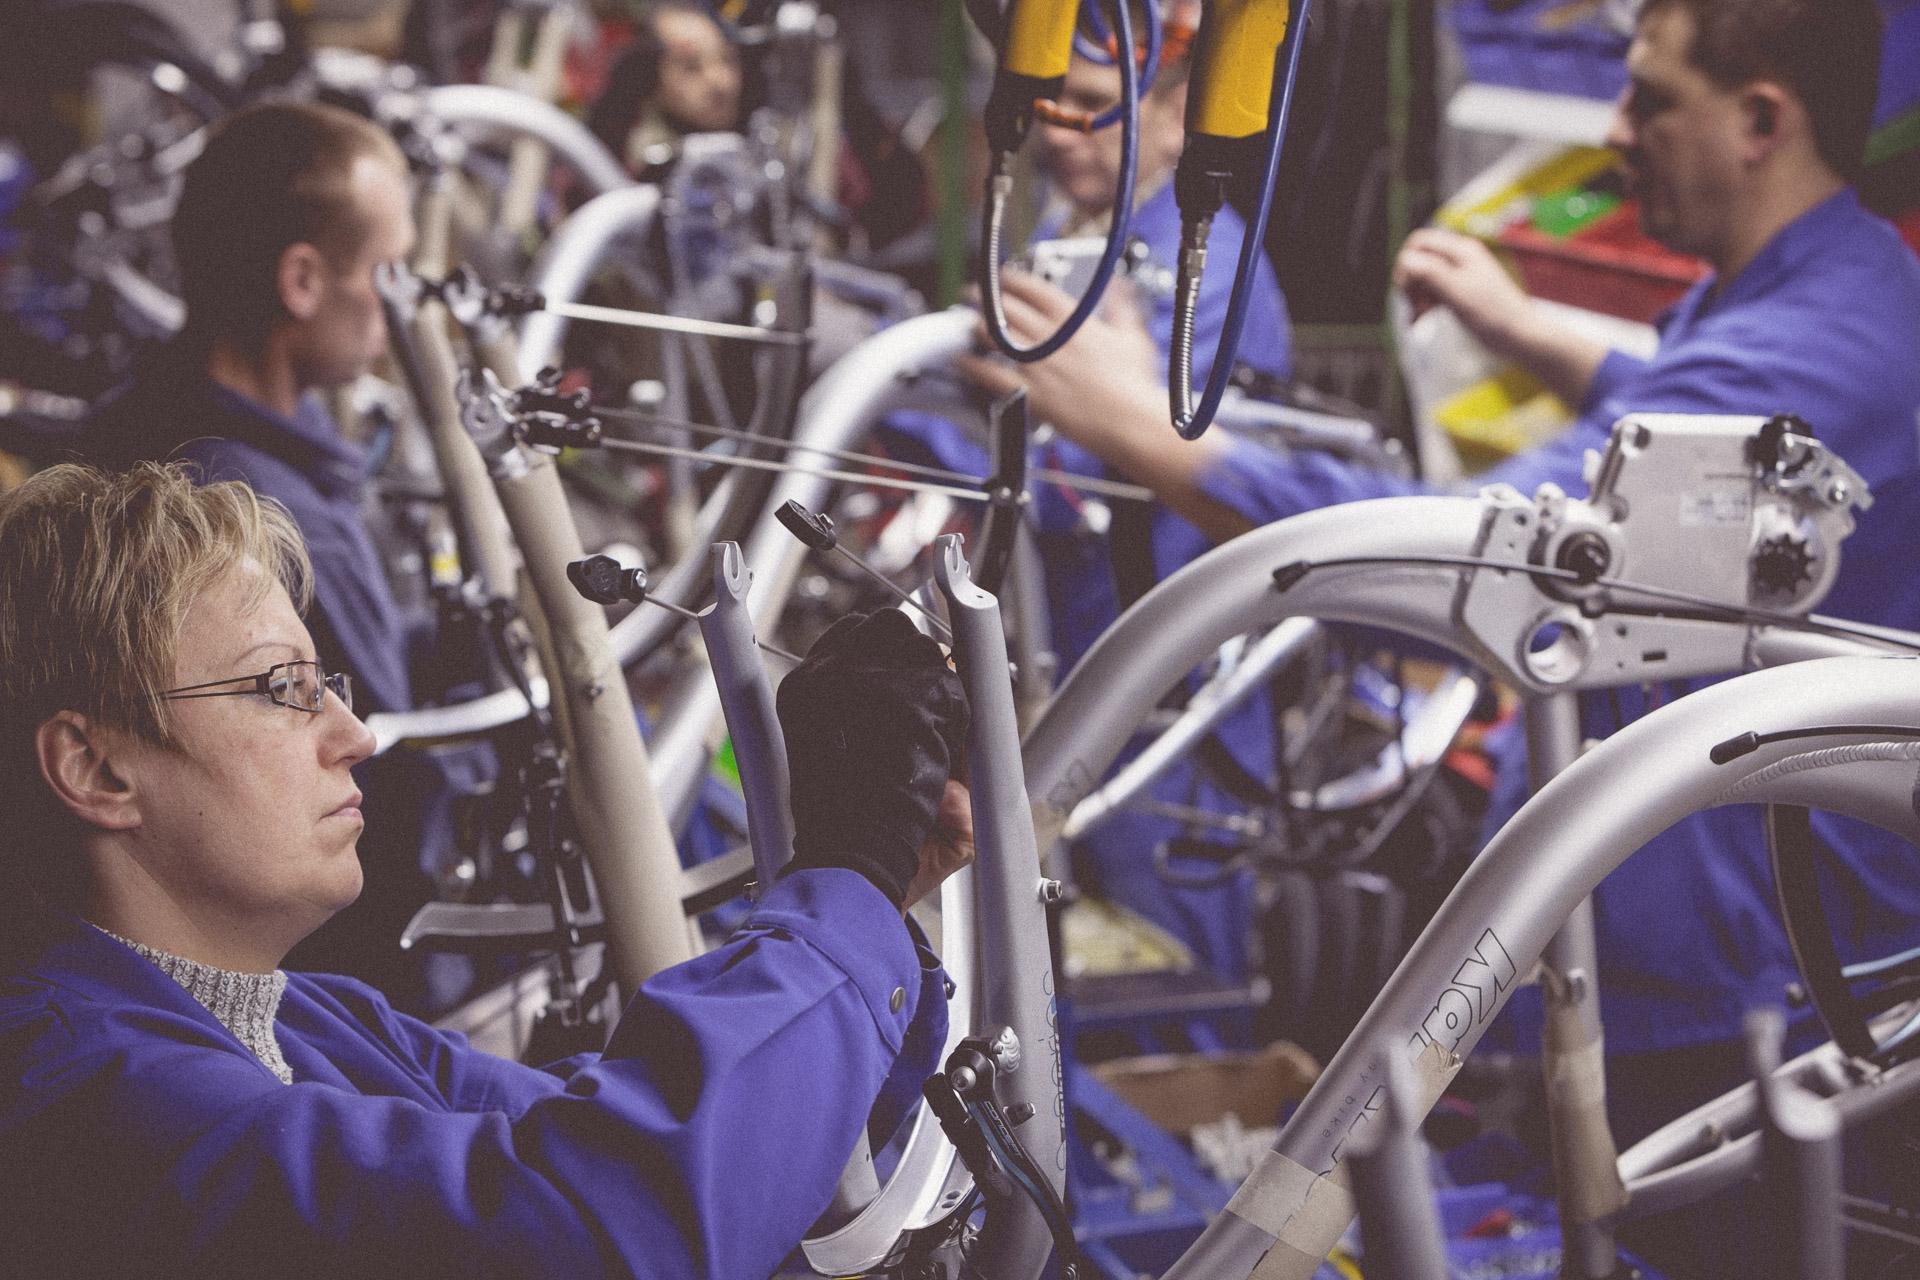 49-Derby-Cycle-Werke-Fahrradproduktion